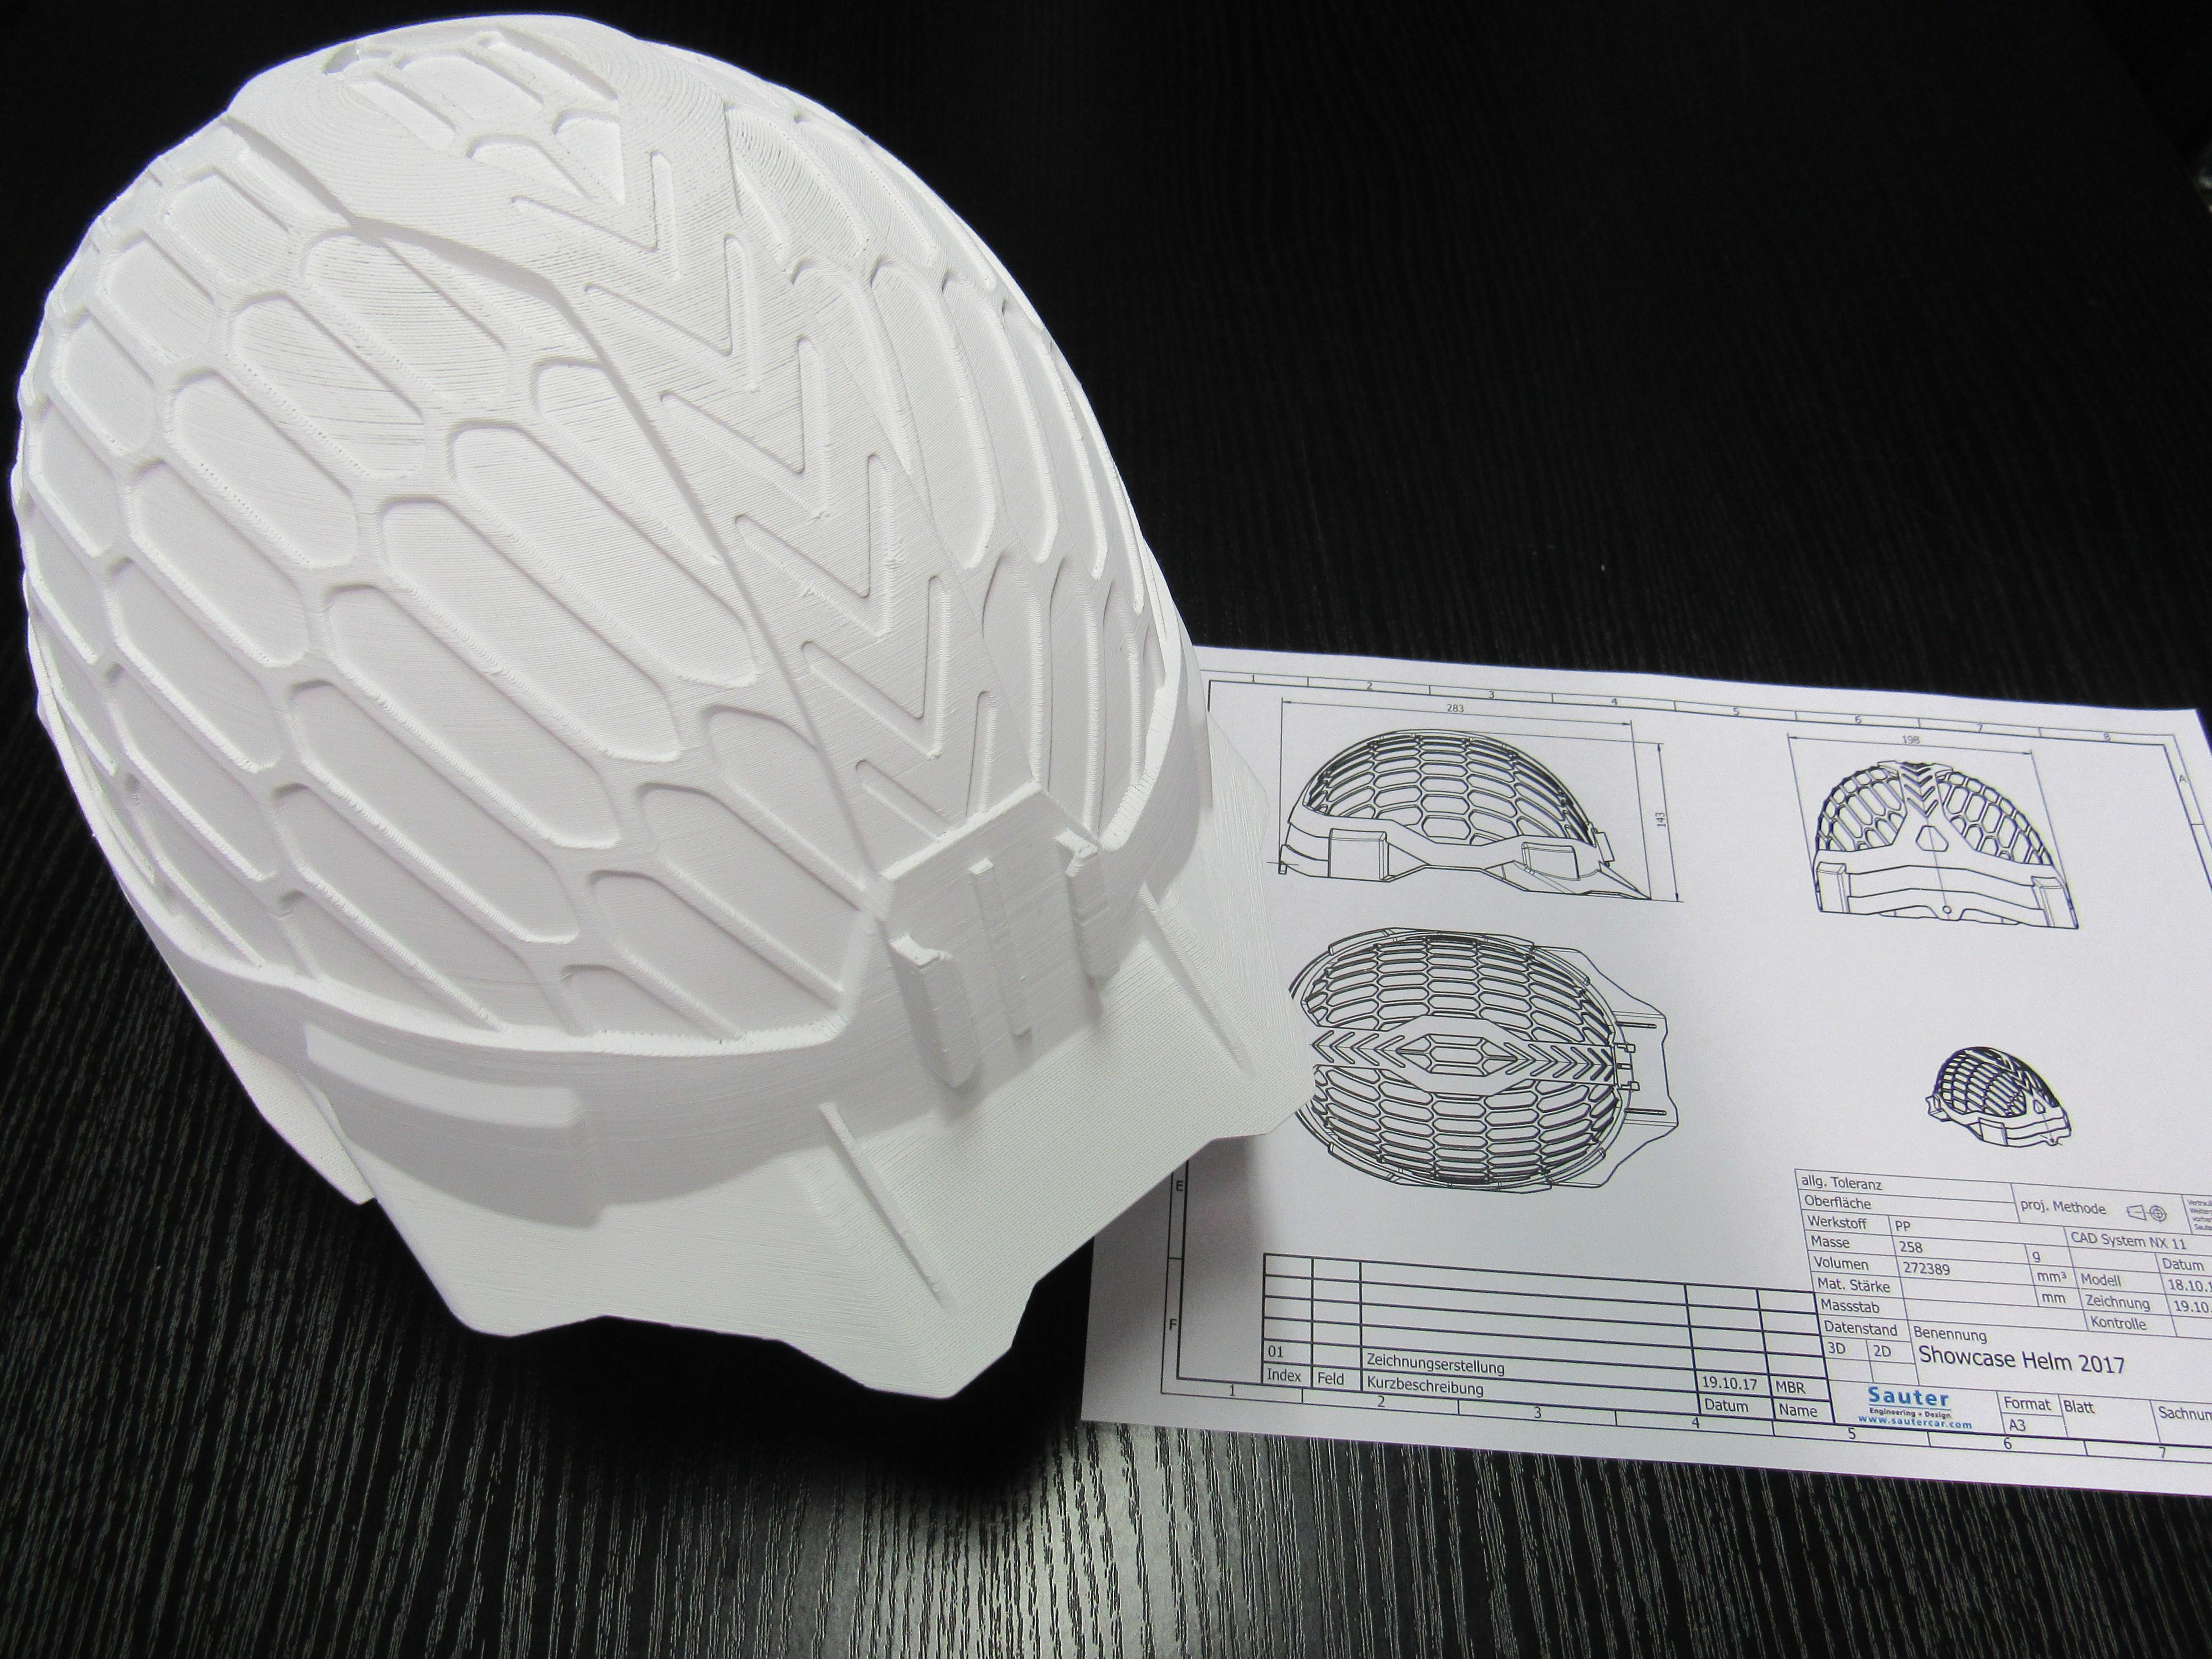 Sauter_E+D_ASA-UVStableGroductionGradeThermoplastic